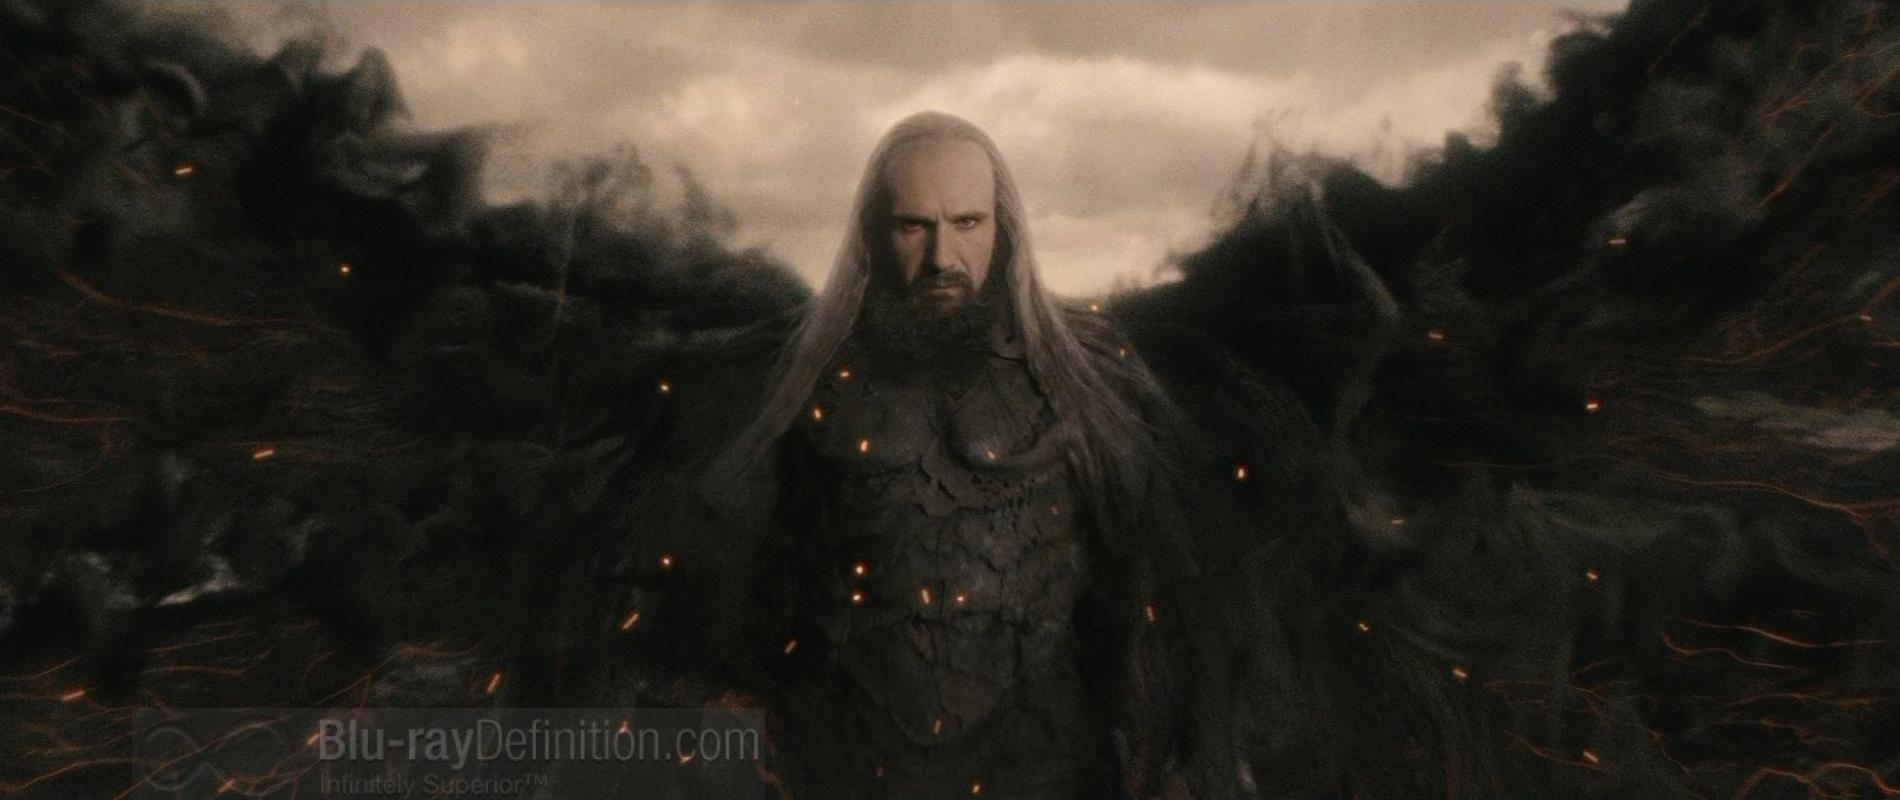 Hades (Clash of the Titans) - Villains Wiki - villains ...